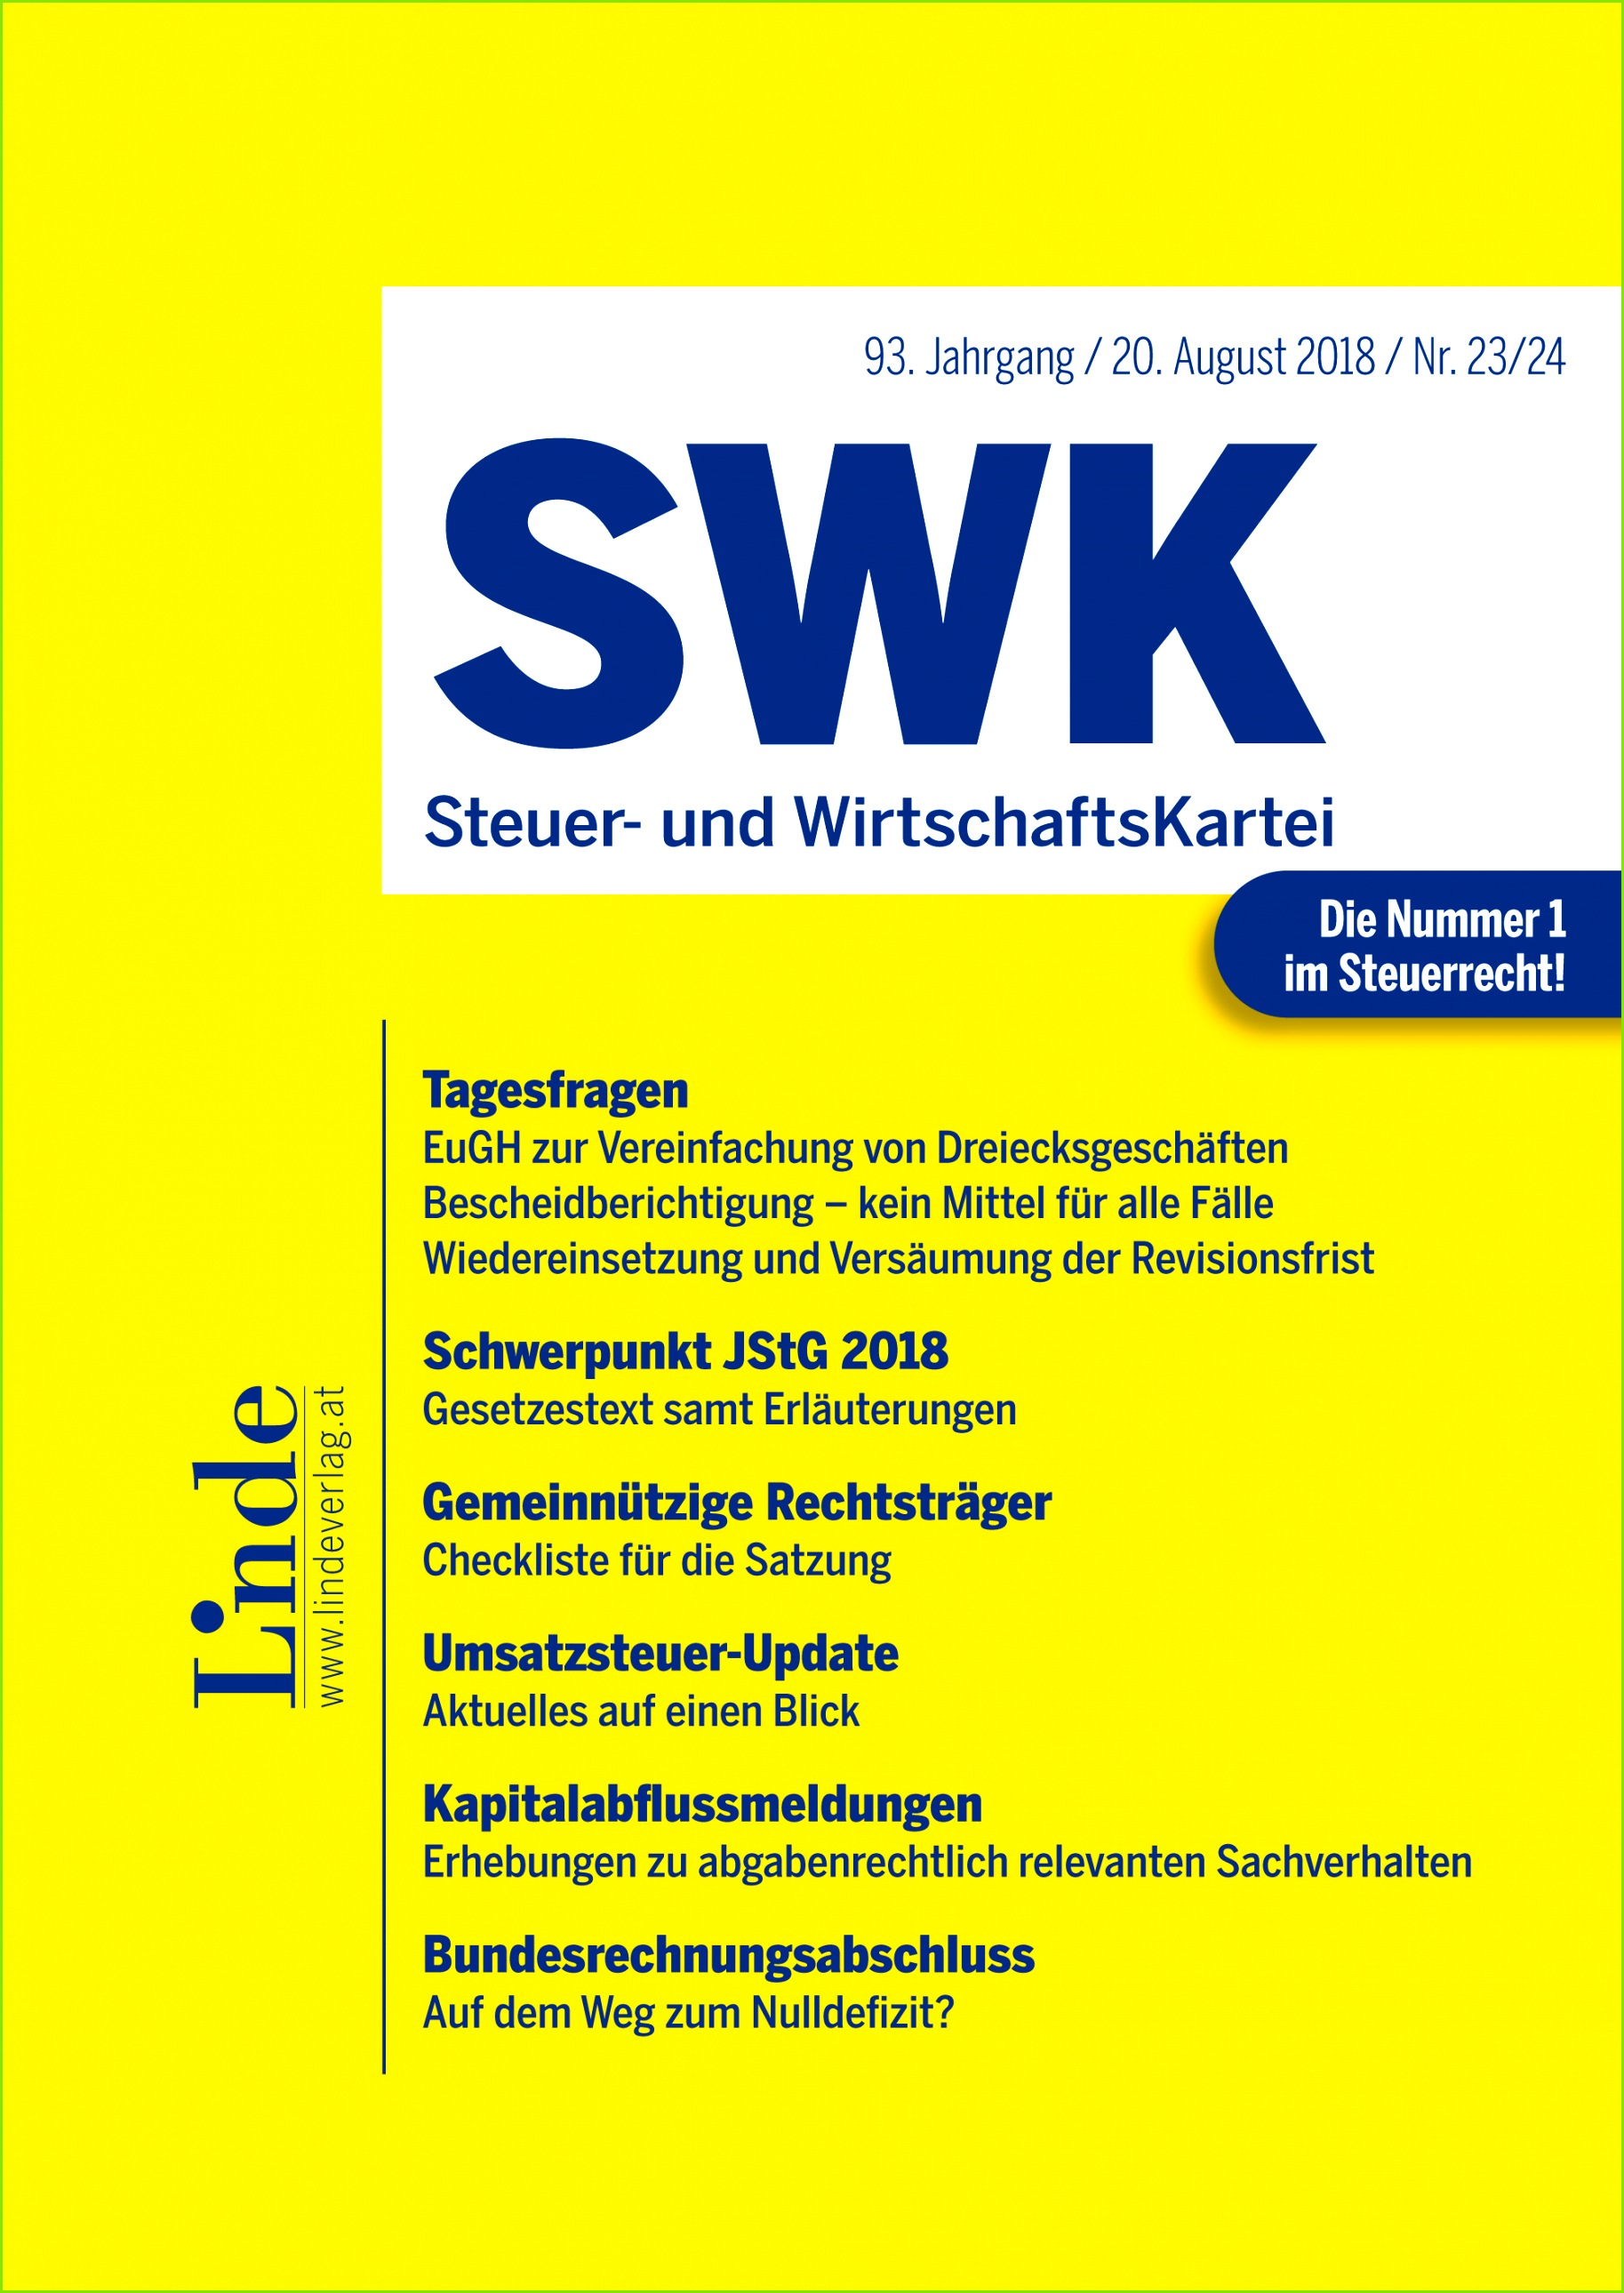 SWK Heft Nr 23 24 2018 · Tagesfragen